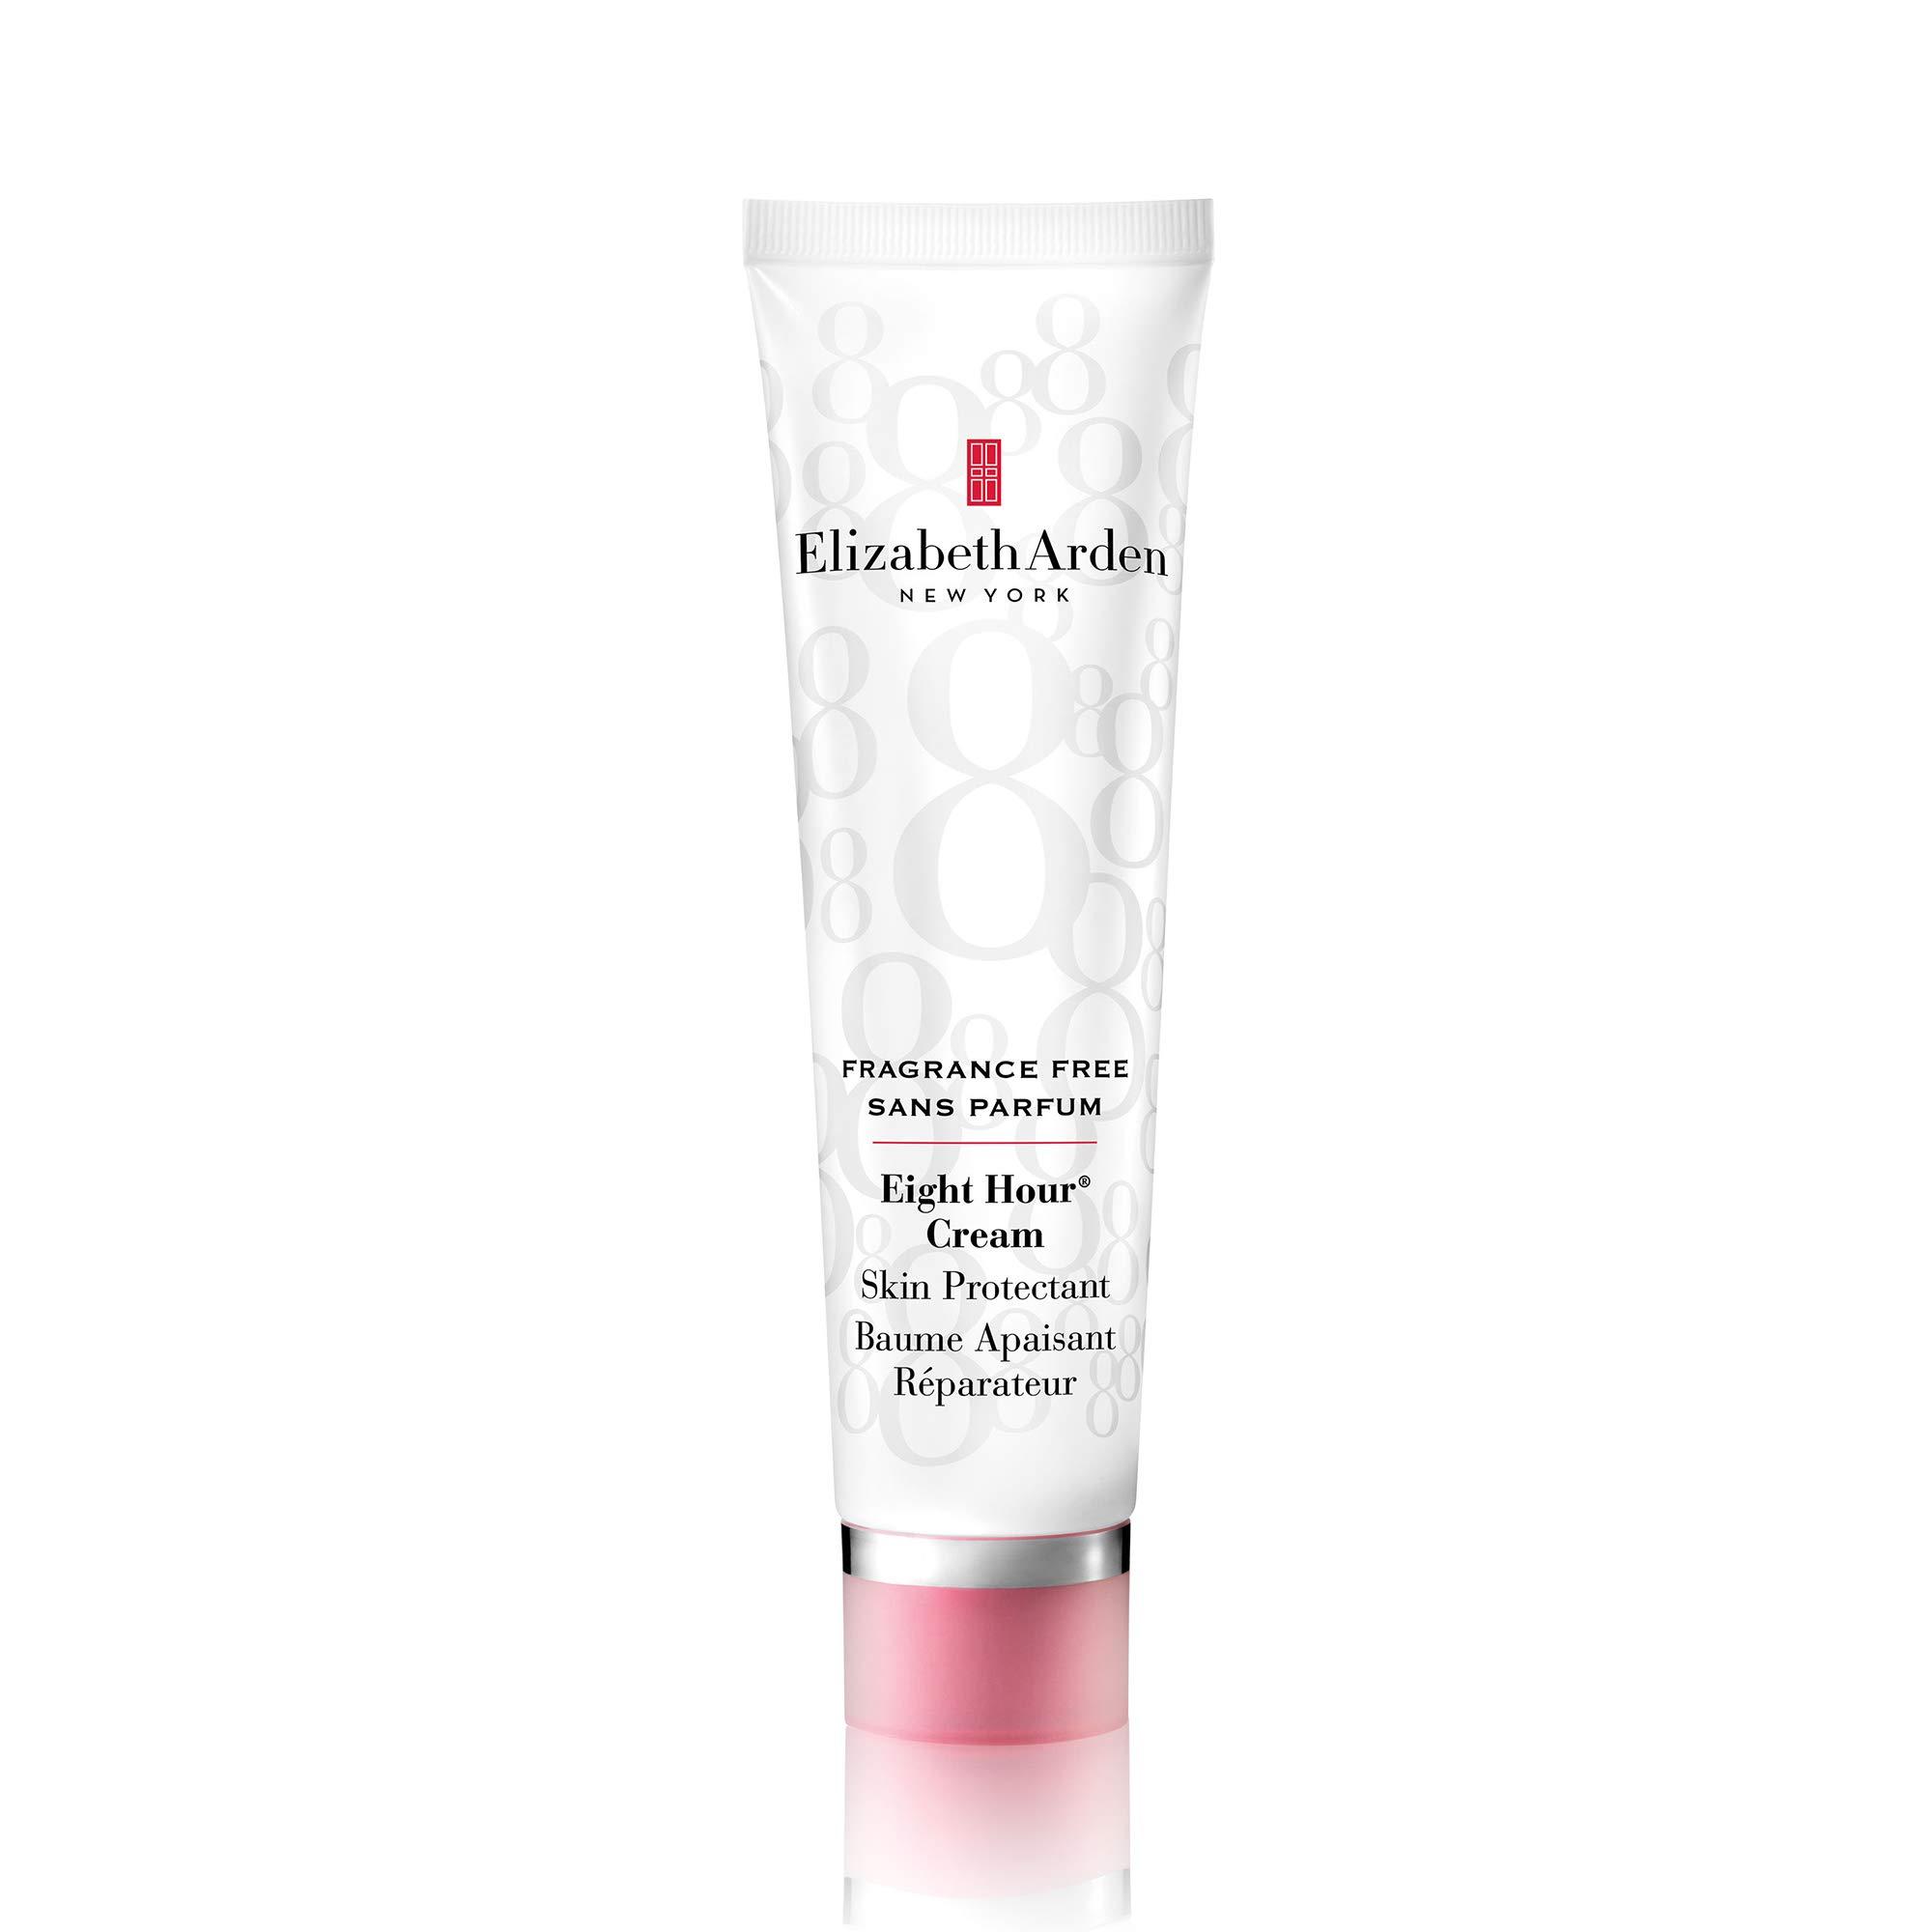 Elizabeth Arden Eight Hour Skin Protectant Cream, Fragrance Free, 1.7 oz. by Elizabeth Arden